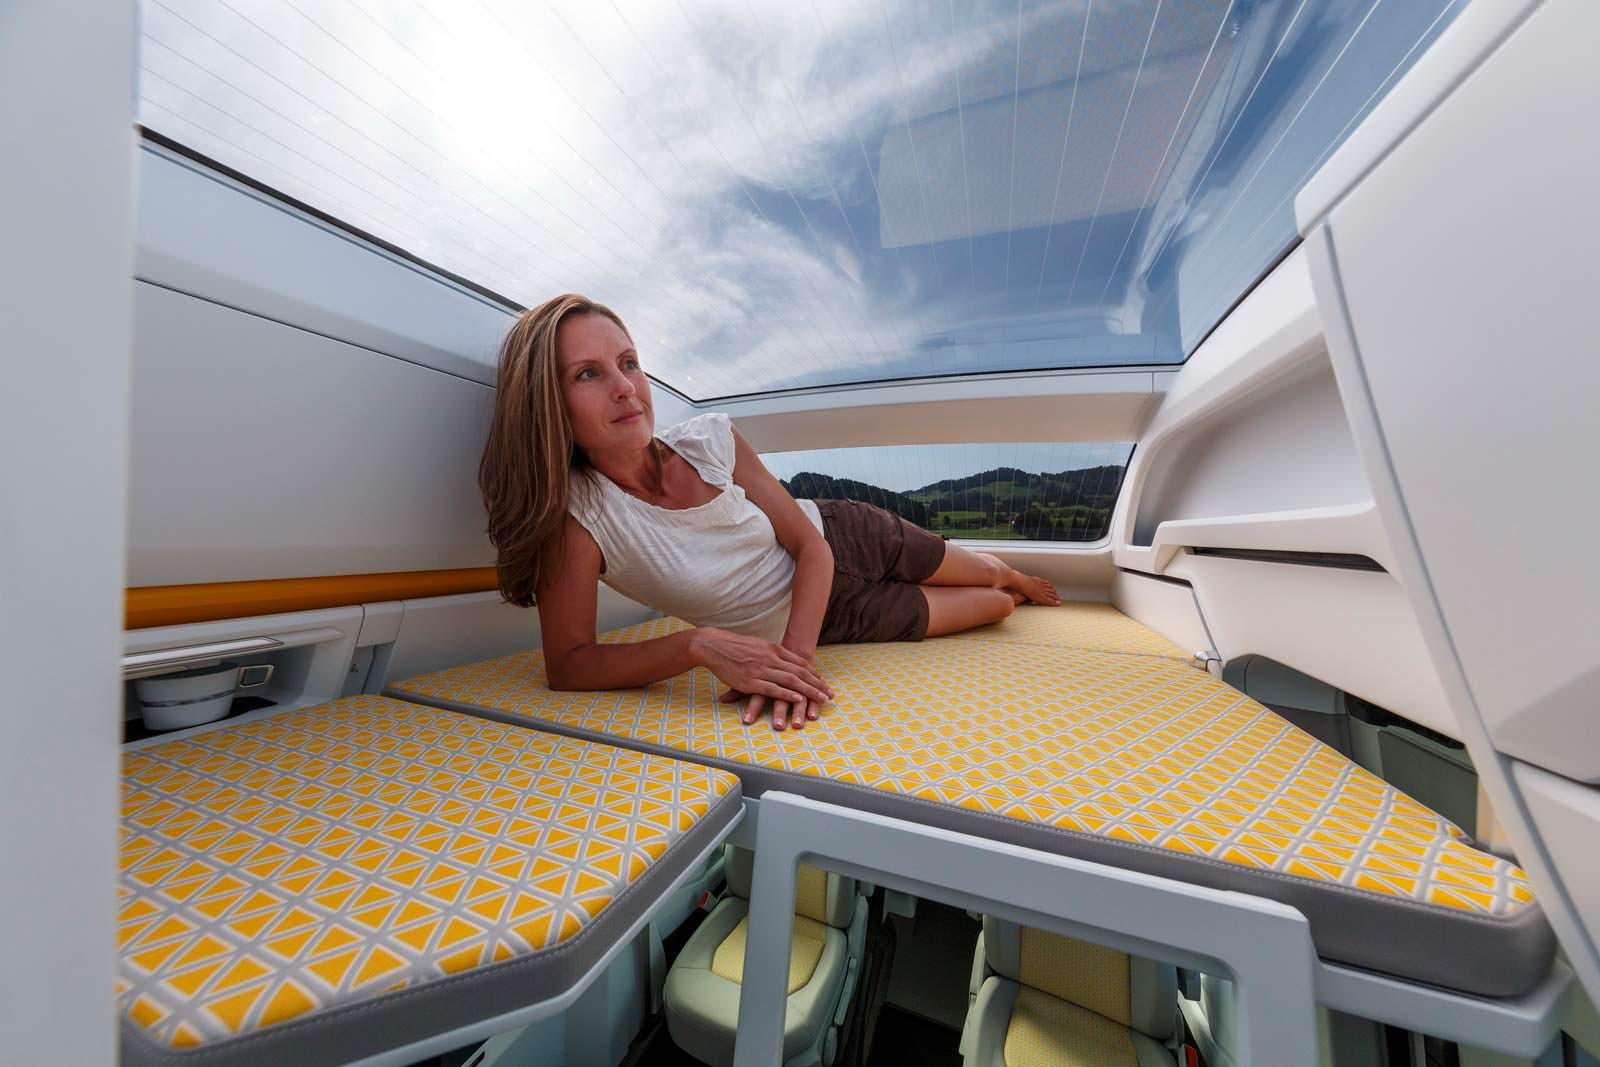 VW California XXL: разные конфигурации кровати на втором ярусе